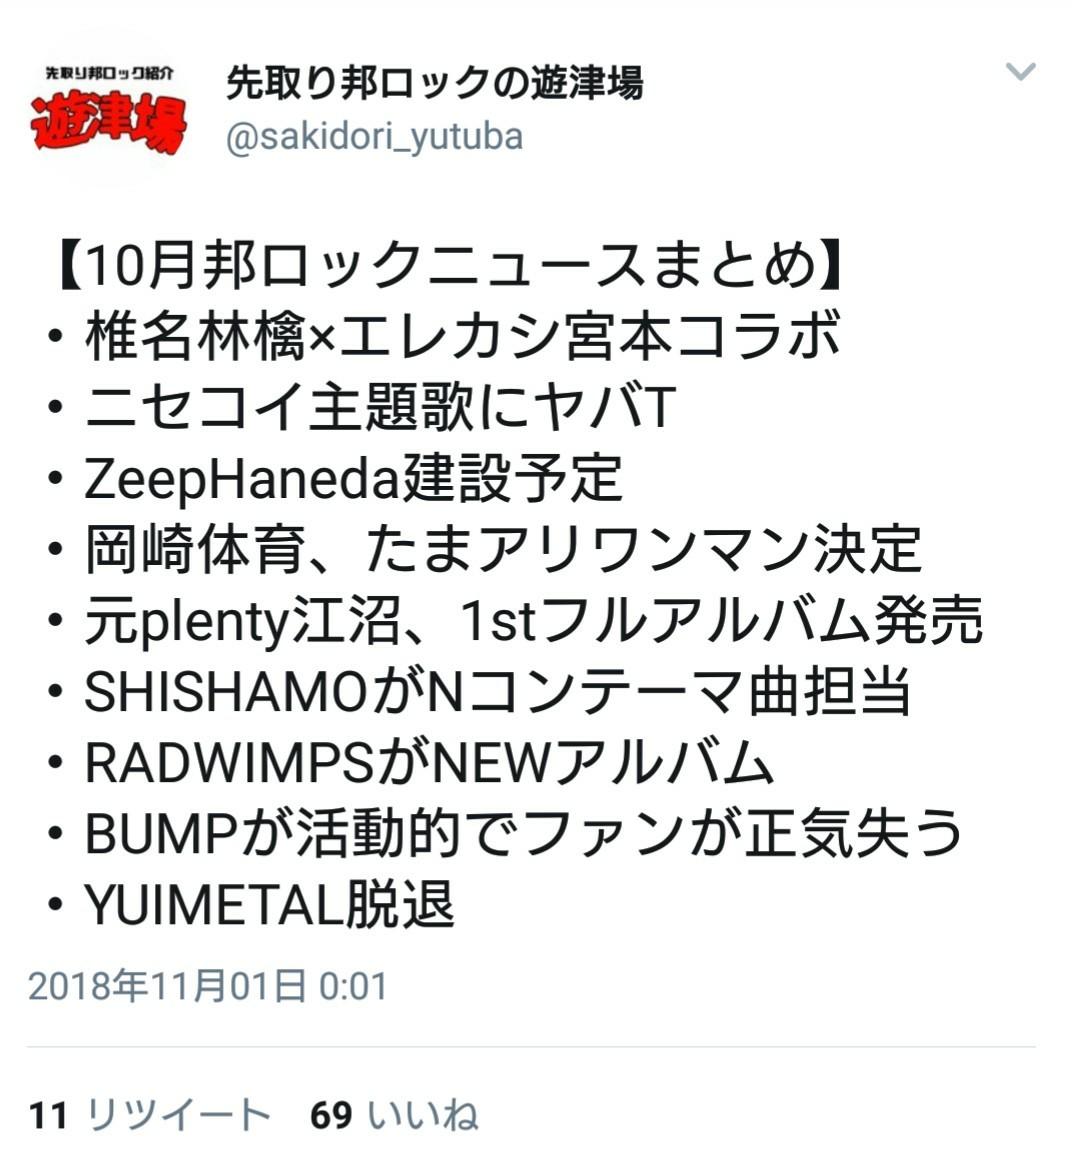 f:id:sakidoriyutsubarock:20181213223932j:plain